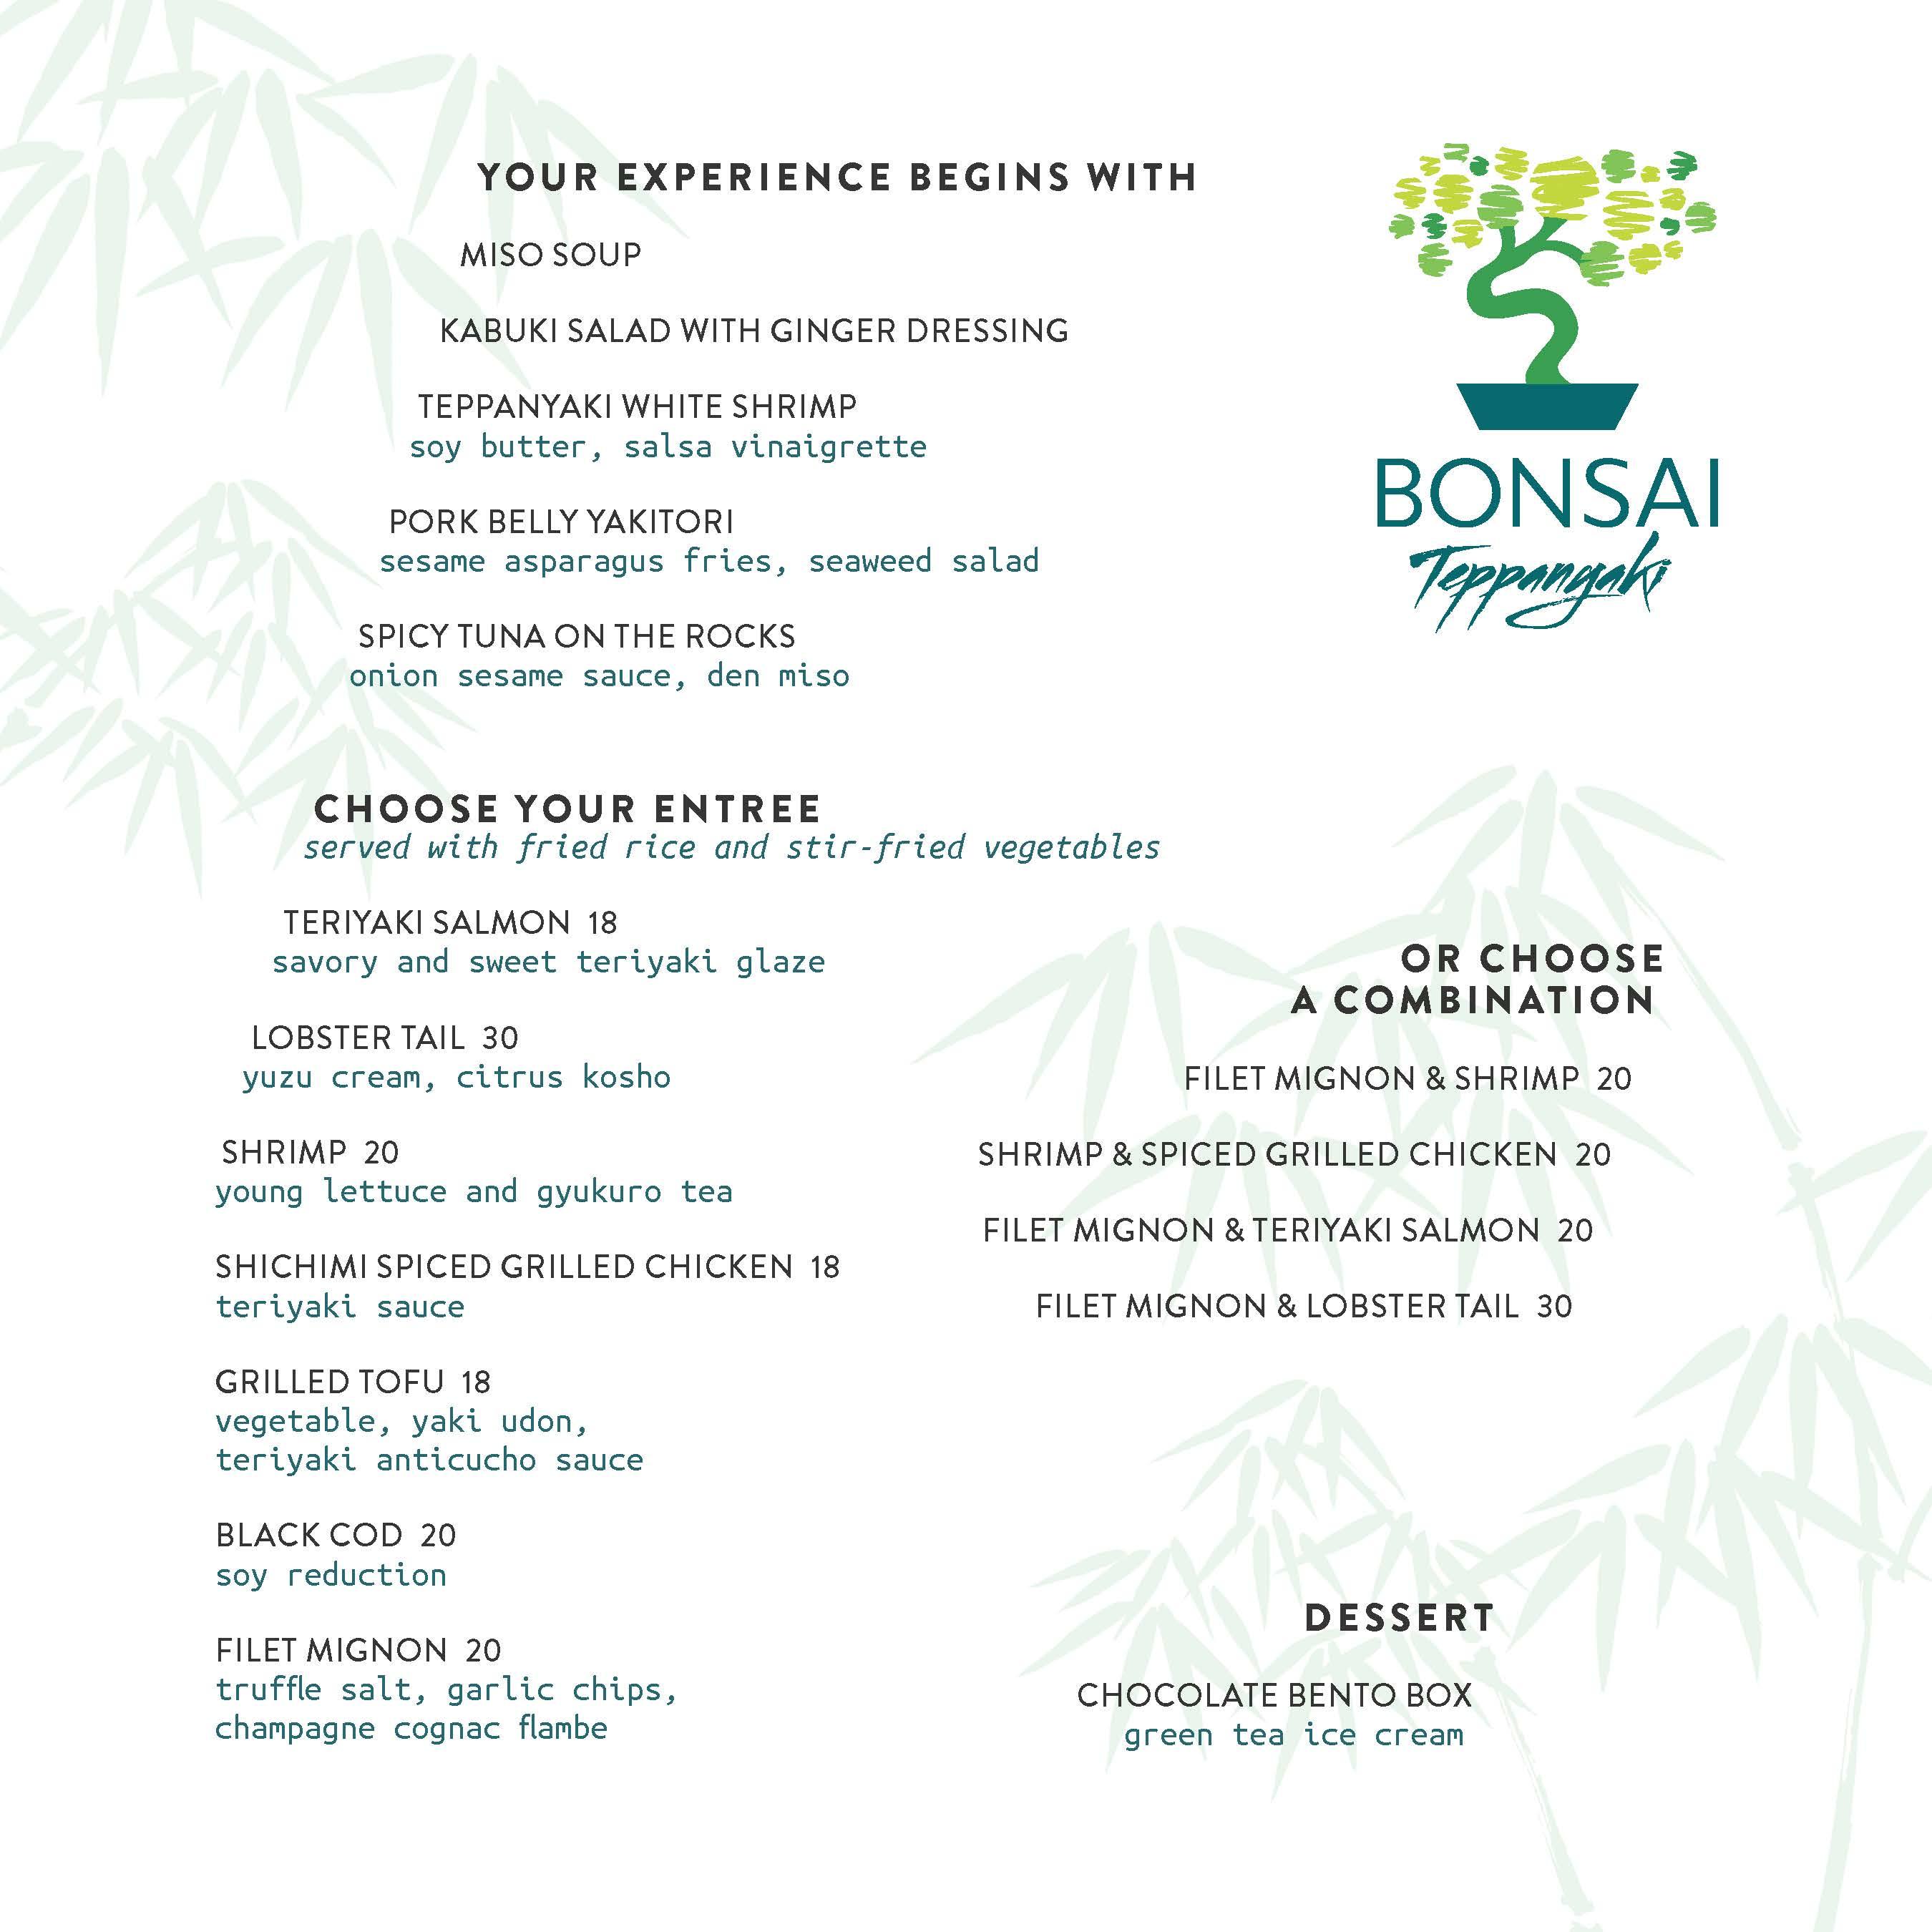 Bonsai Teppanyaki Menu